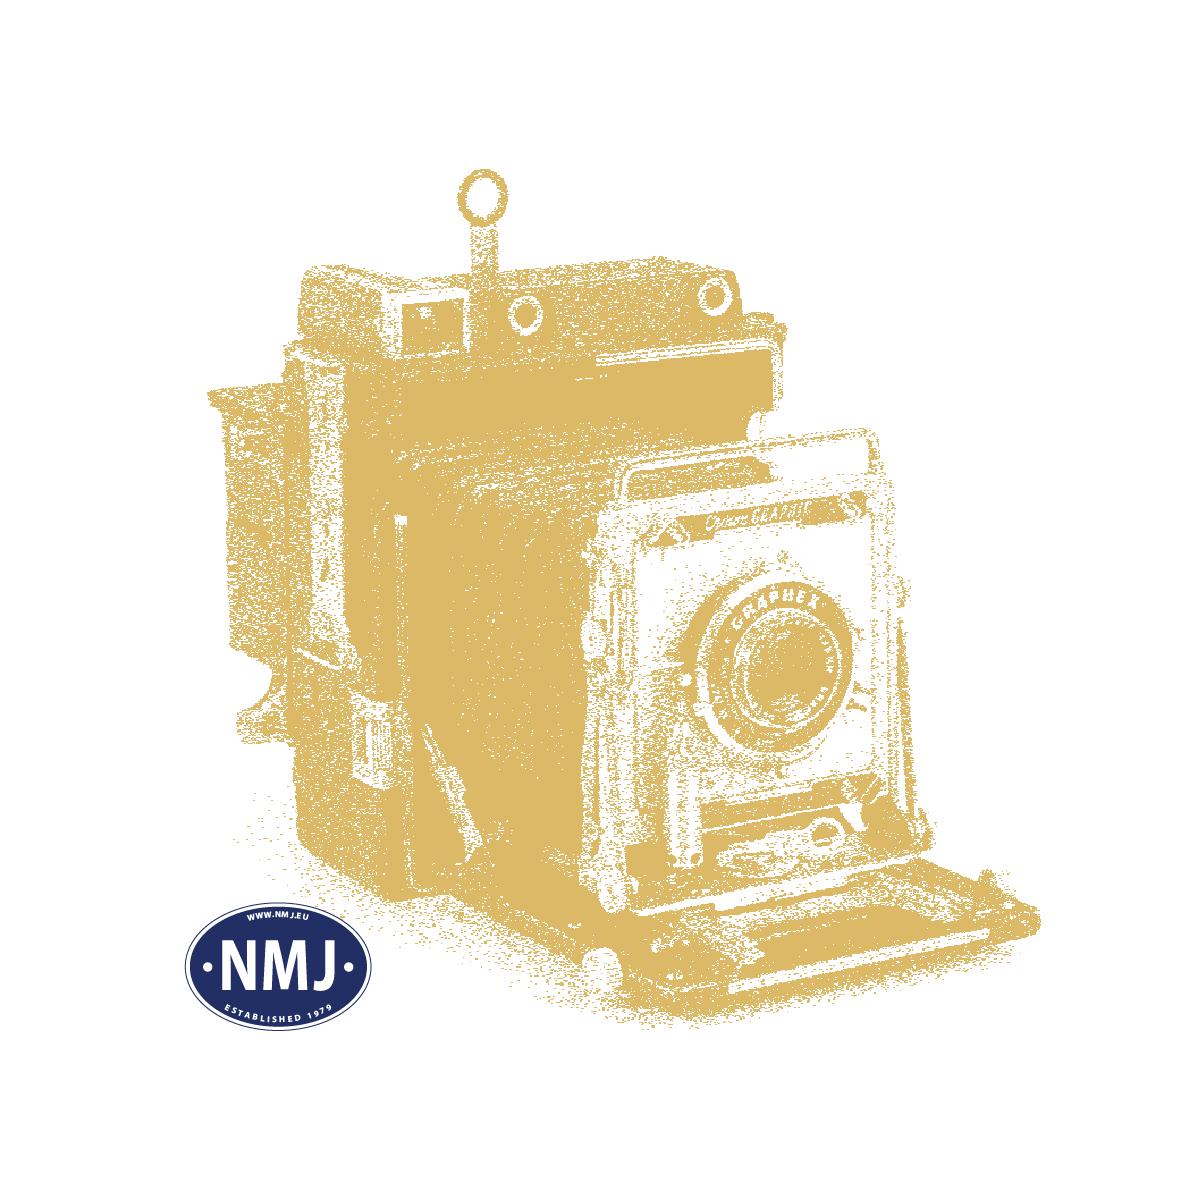 NMJT131.301 - NMJ Topline NSB B3-2 Type 3 25516, Nydesign